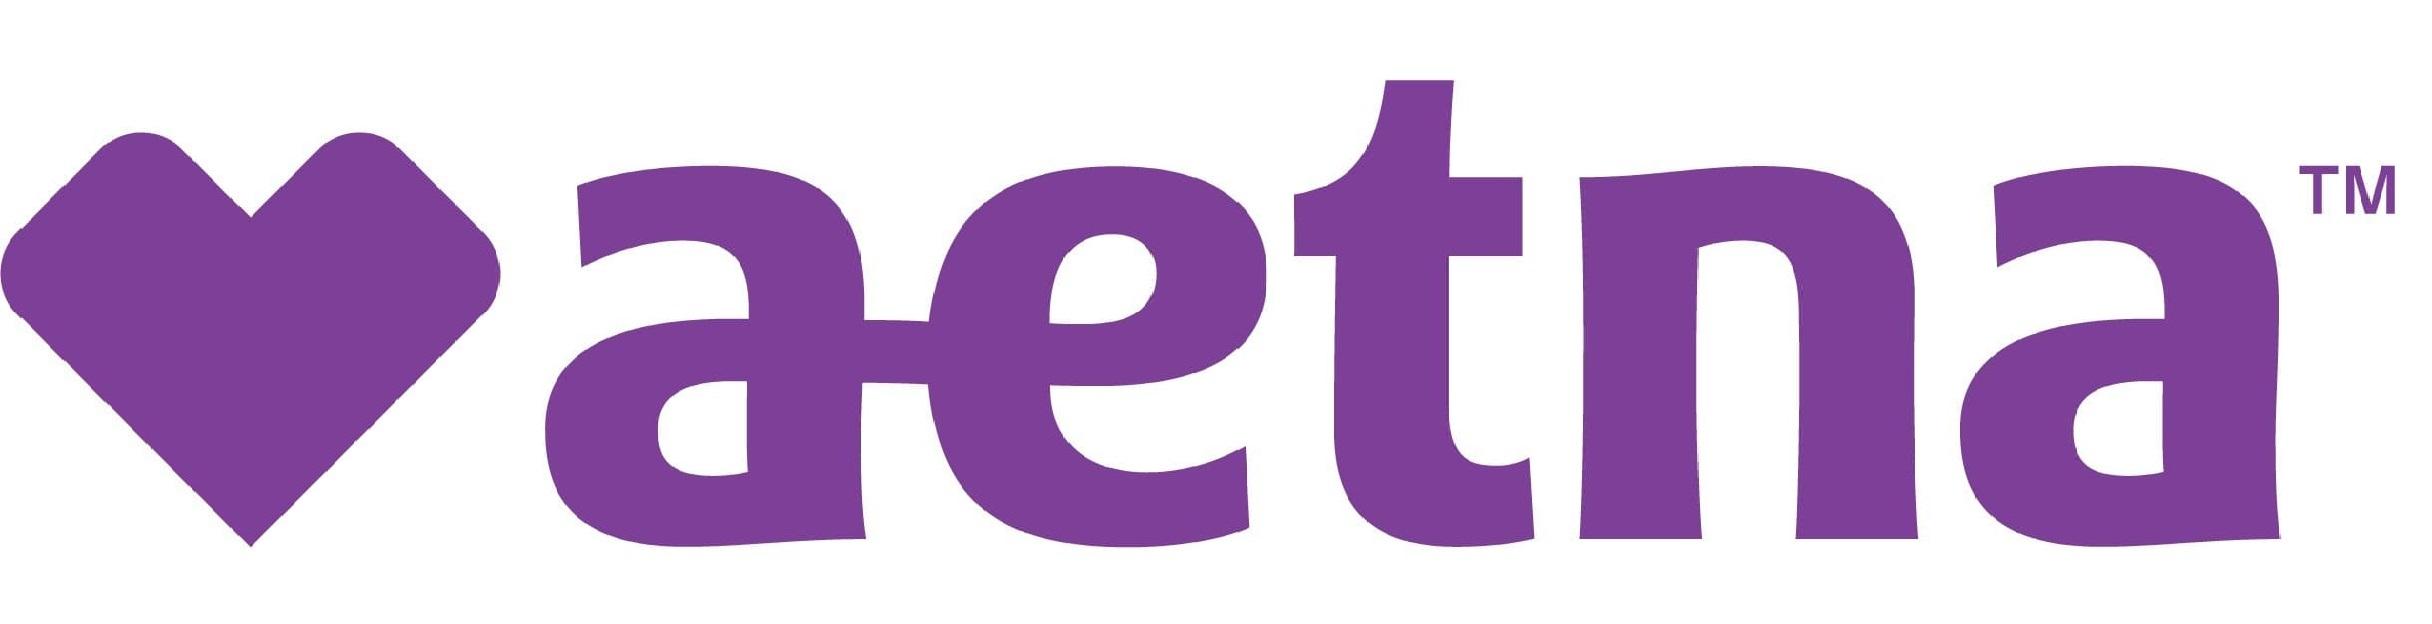 Aetna-logo-crop